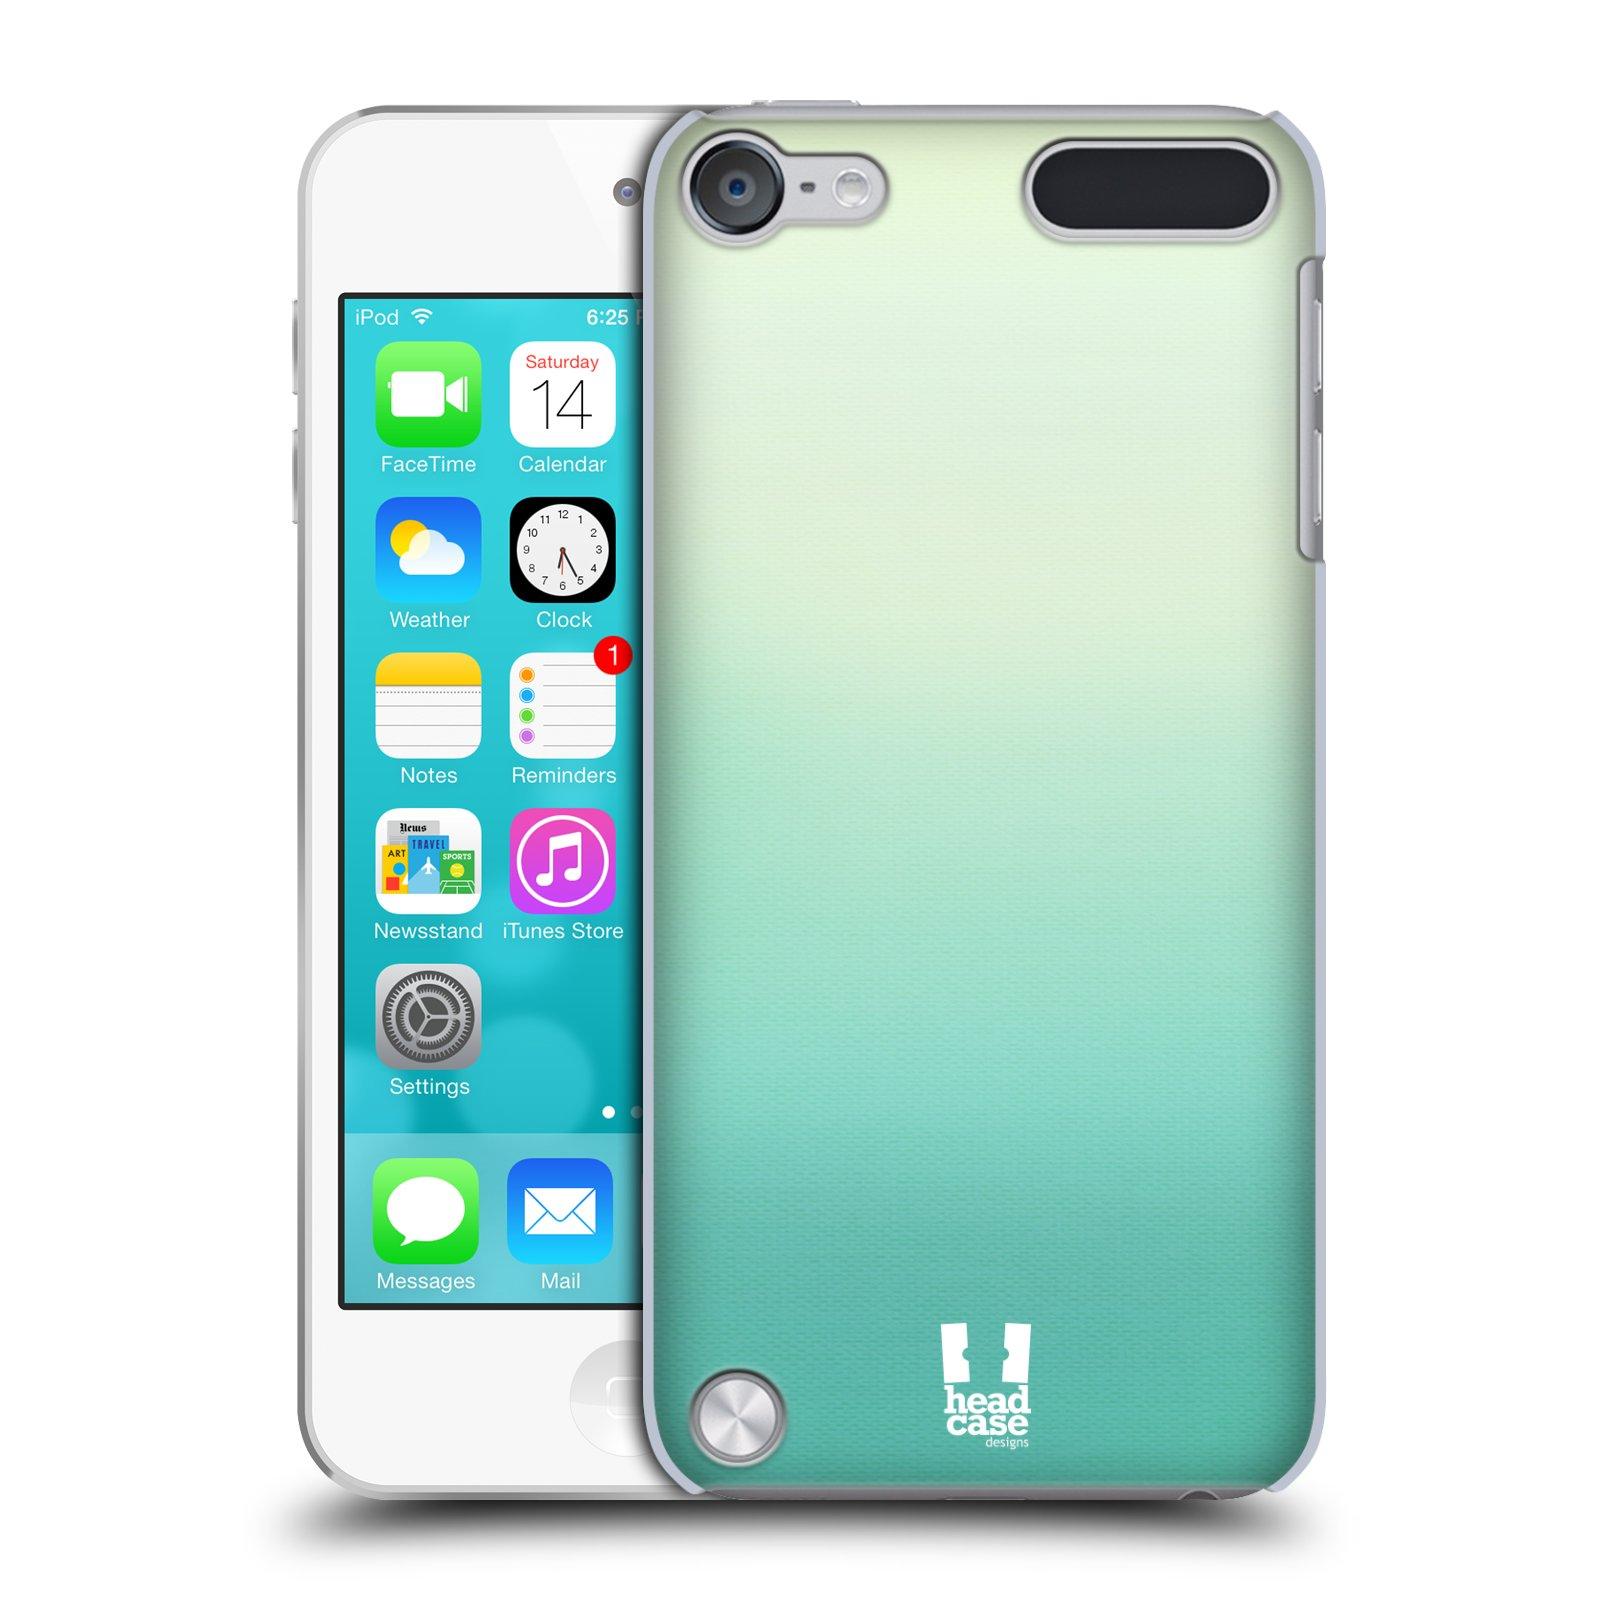 head case designs ombre hard back case for apple ipod touch 6g 6th gen ebay. Black Bedroom Furniture Sets. Home Design Ideas